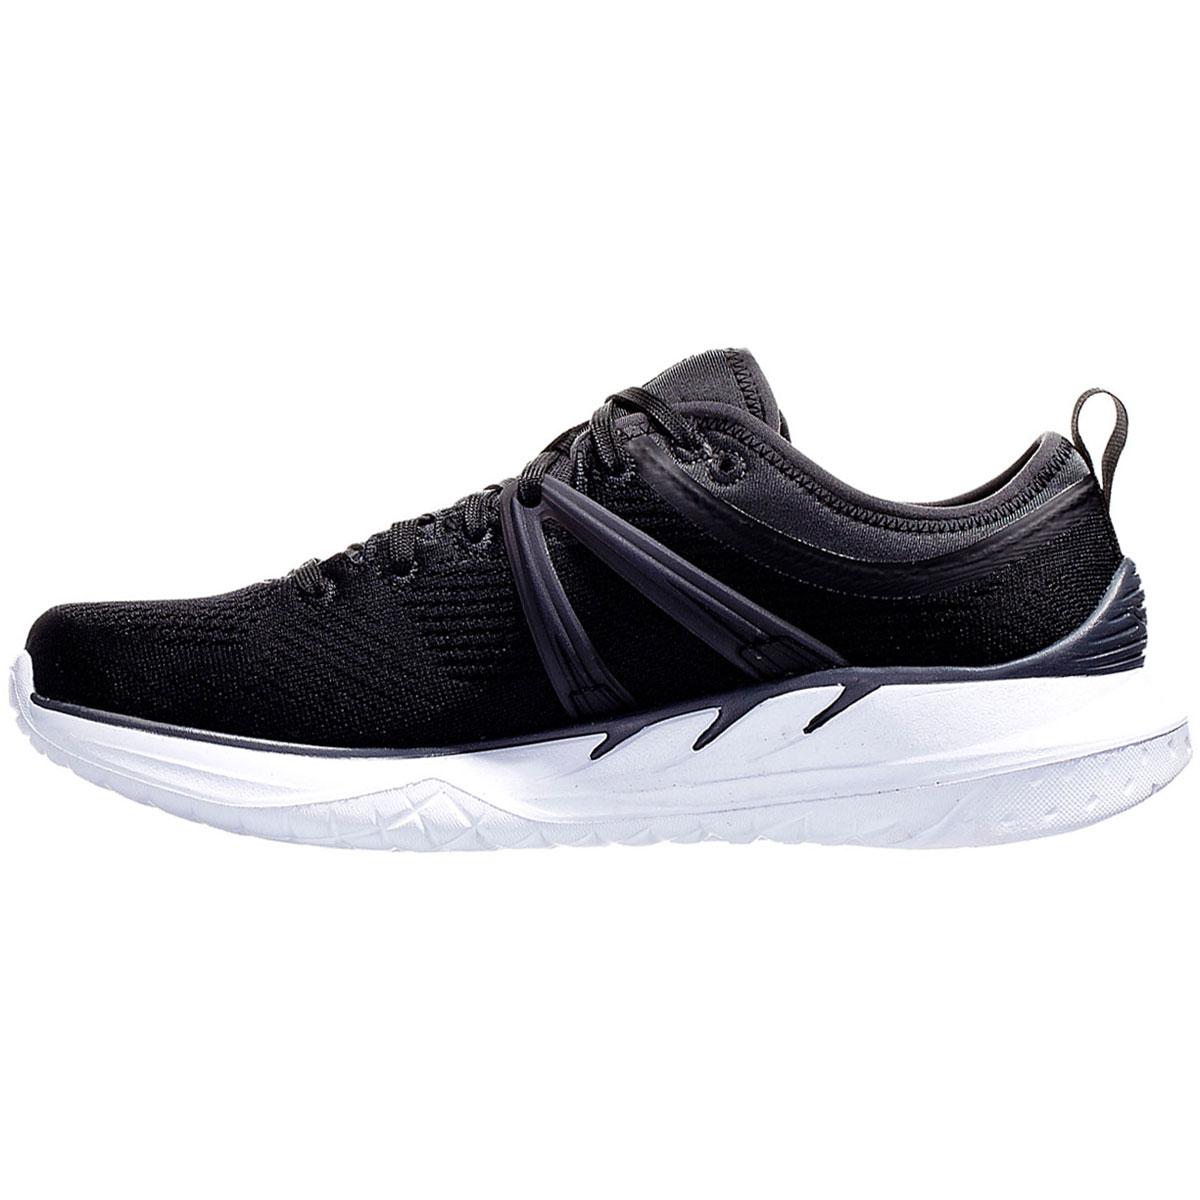 Women's Hoka One One Tivra Running Shoe - Color: Black/Dark Shadow - Size: 5 - Width: Regular, Black/Dark Shadow, large, image 5